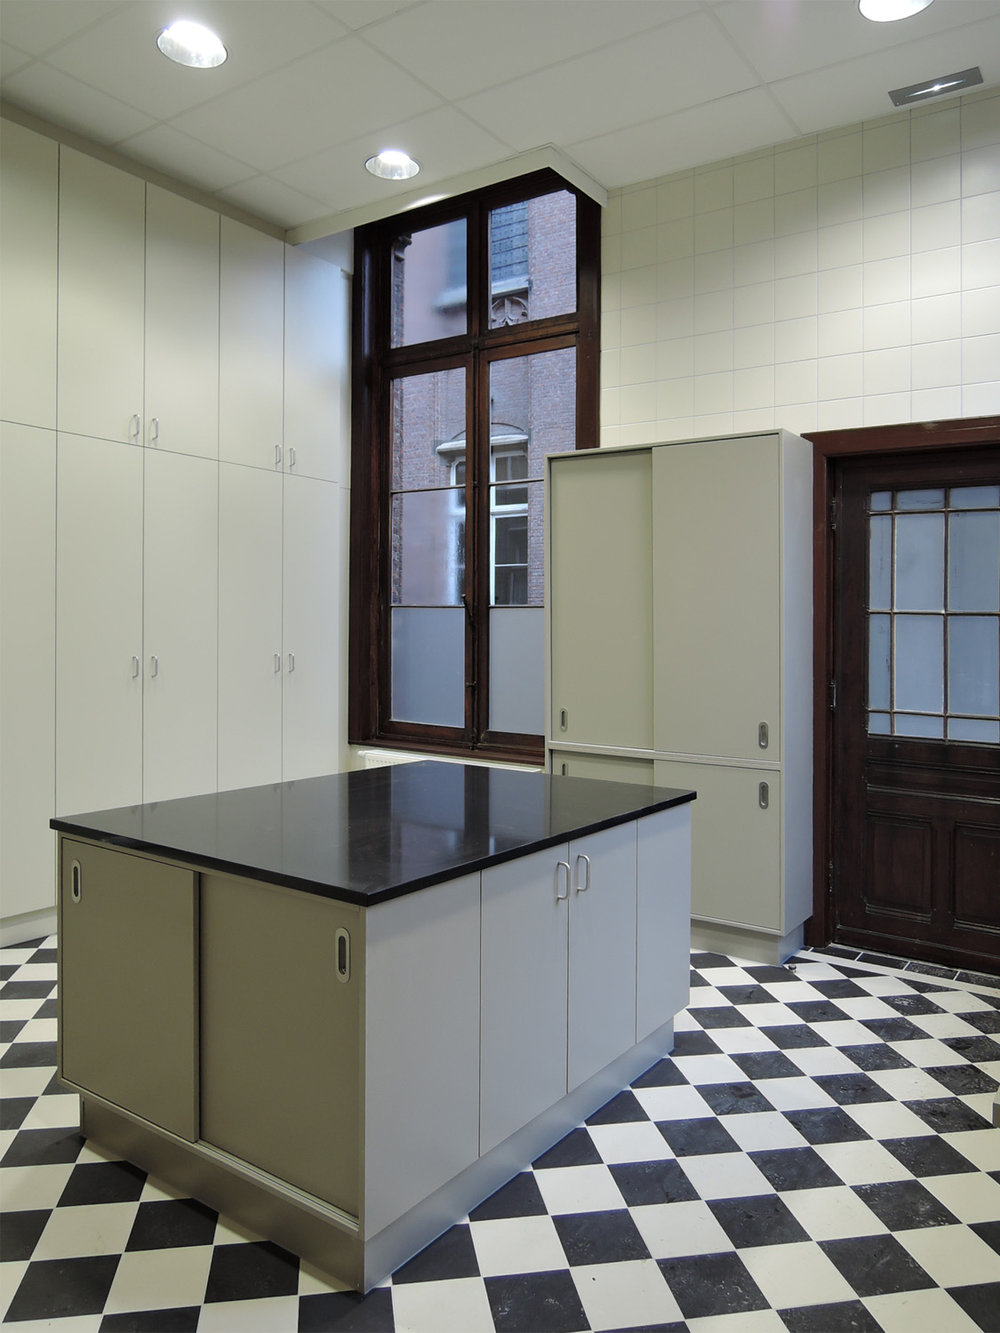 Sint-Lievenscollege, keuken - Antwerpen